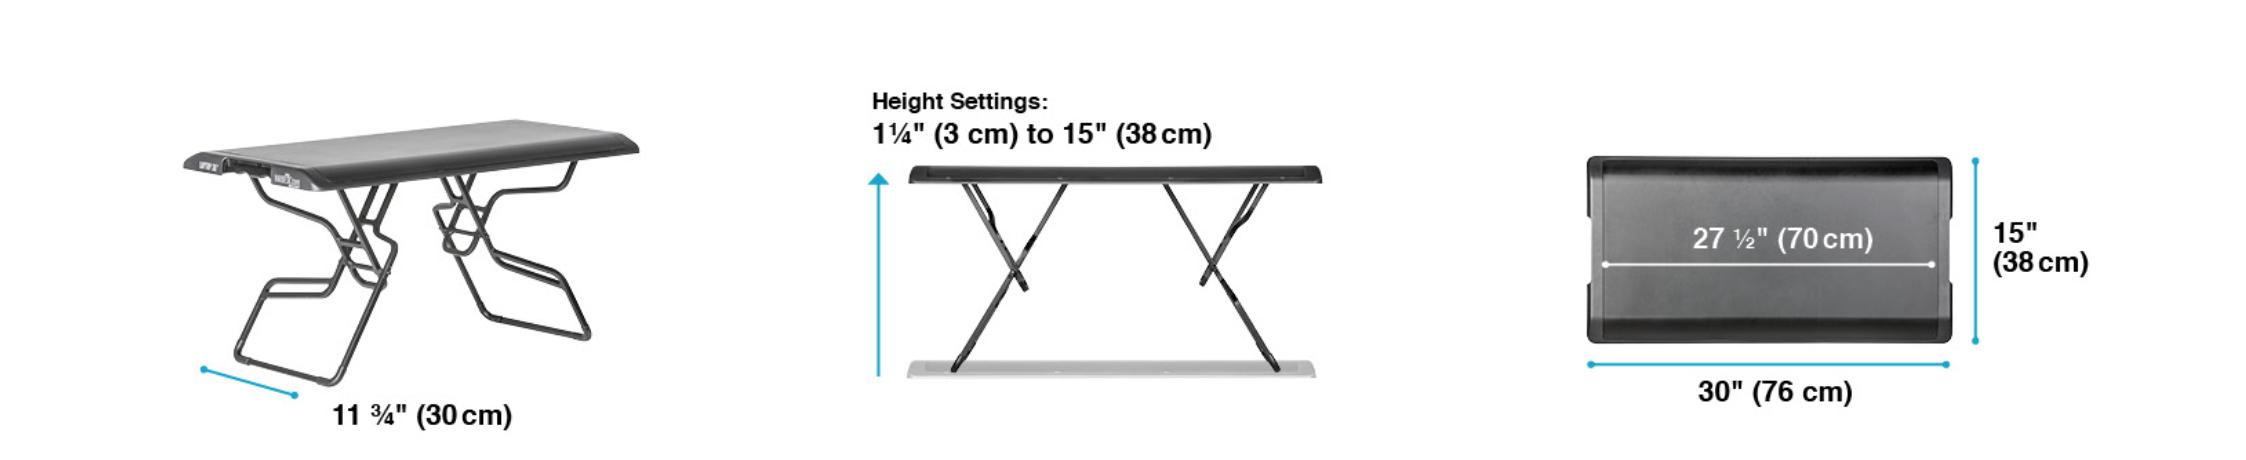 varidesk laptop 30 dimensions